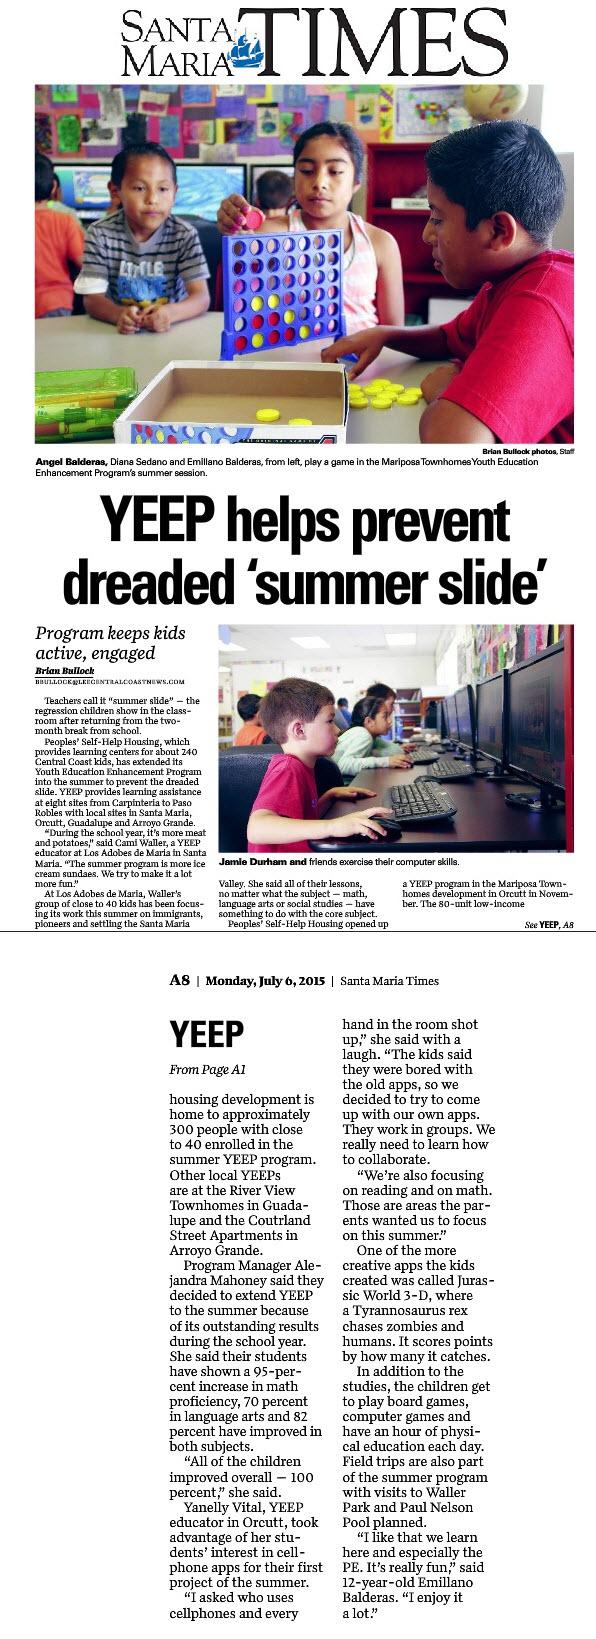 YEEP helps prevent dreaded 'summer slide' - Santa Maria Times